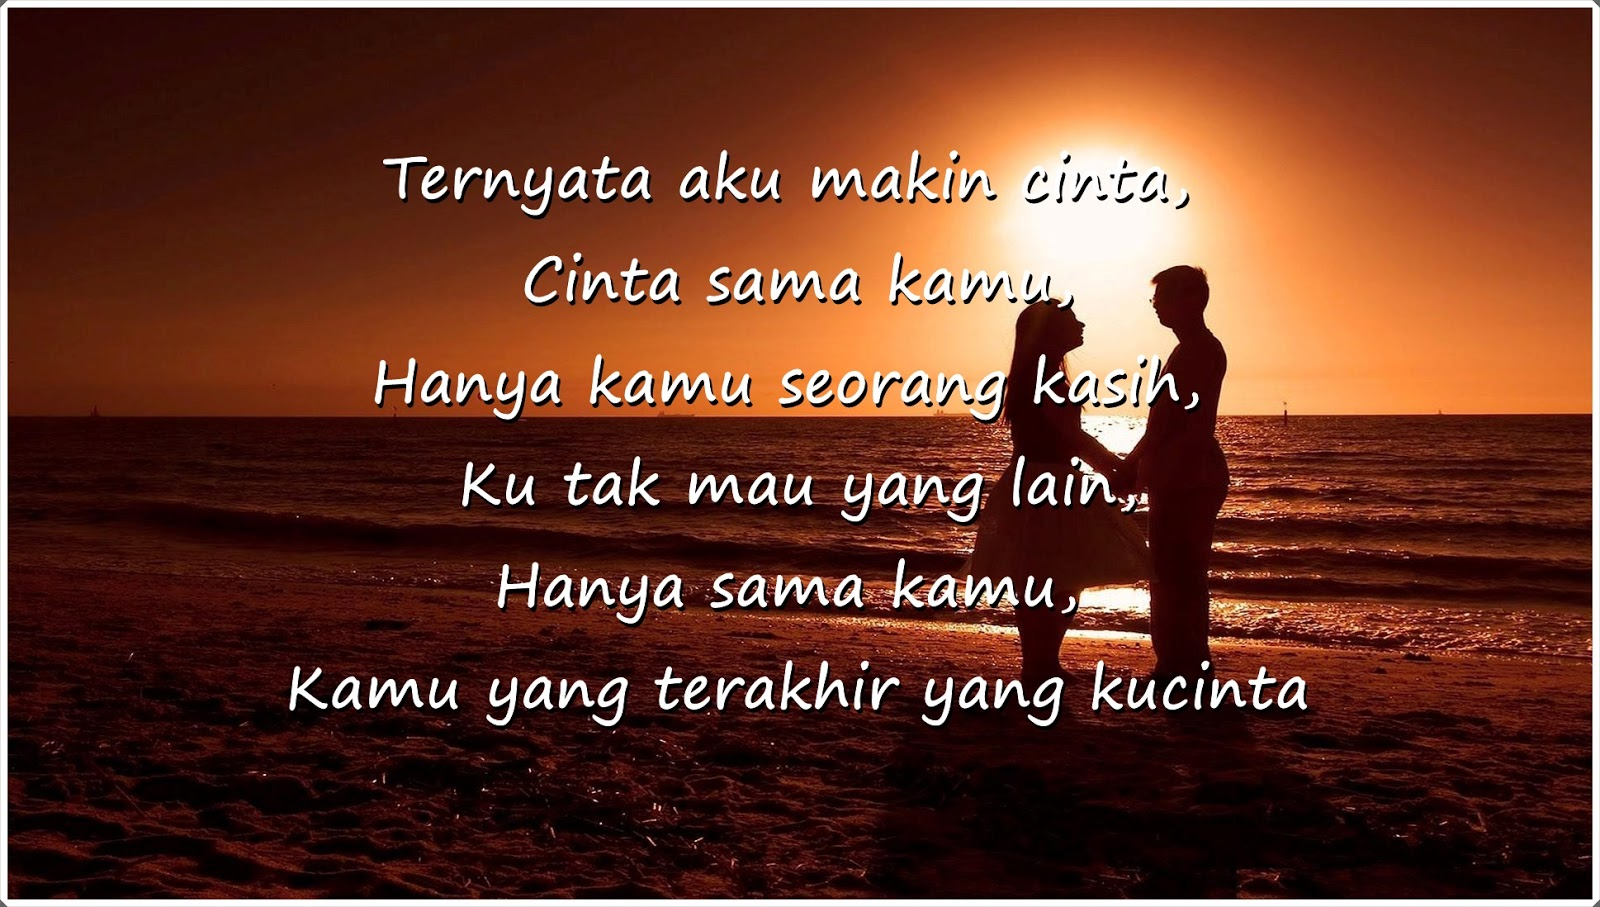 Lirik Lagu Tentang Cinta Paling Romantis Kata Cinta Yang Menyentuh Hati Jdsk